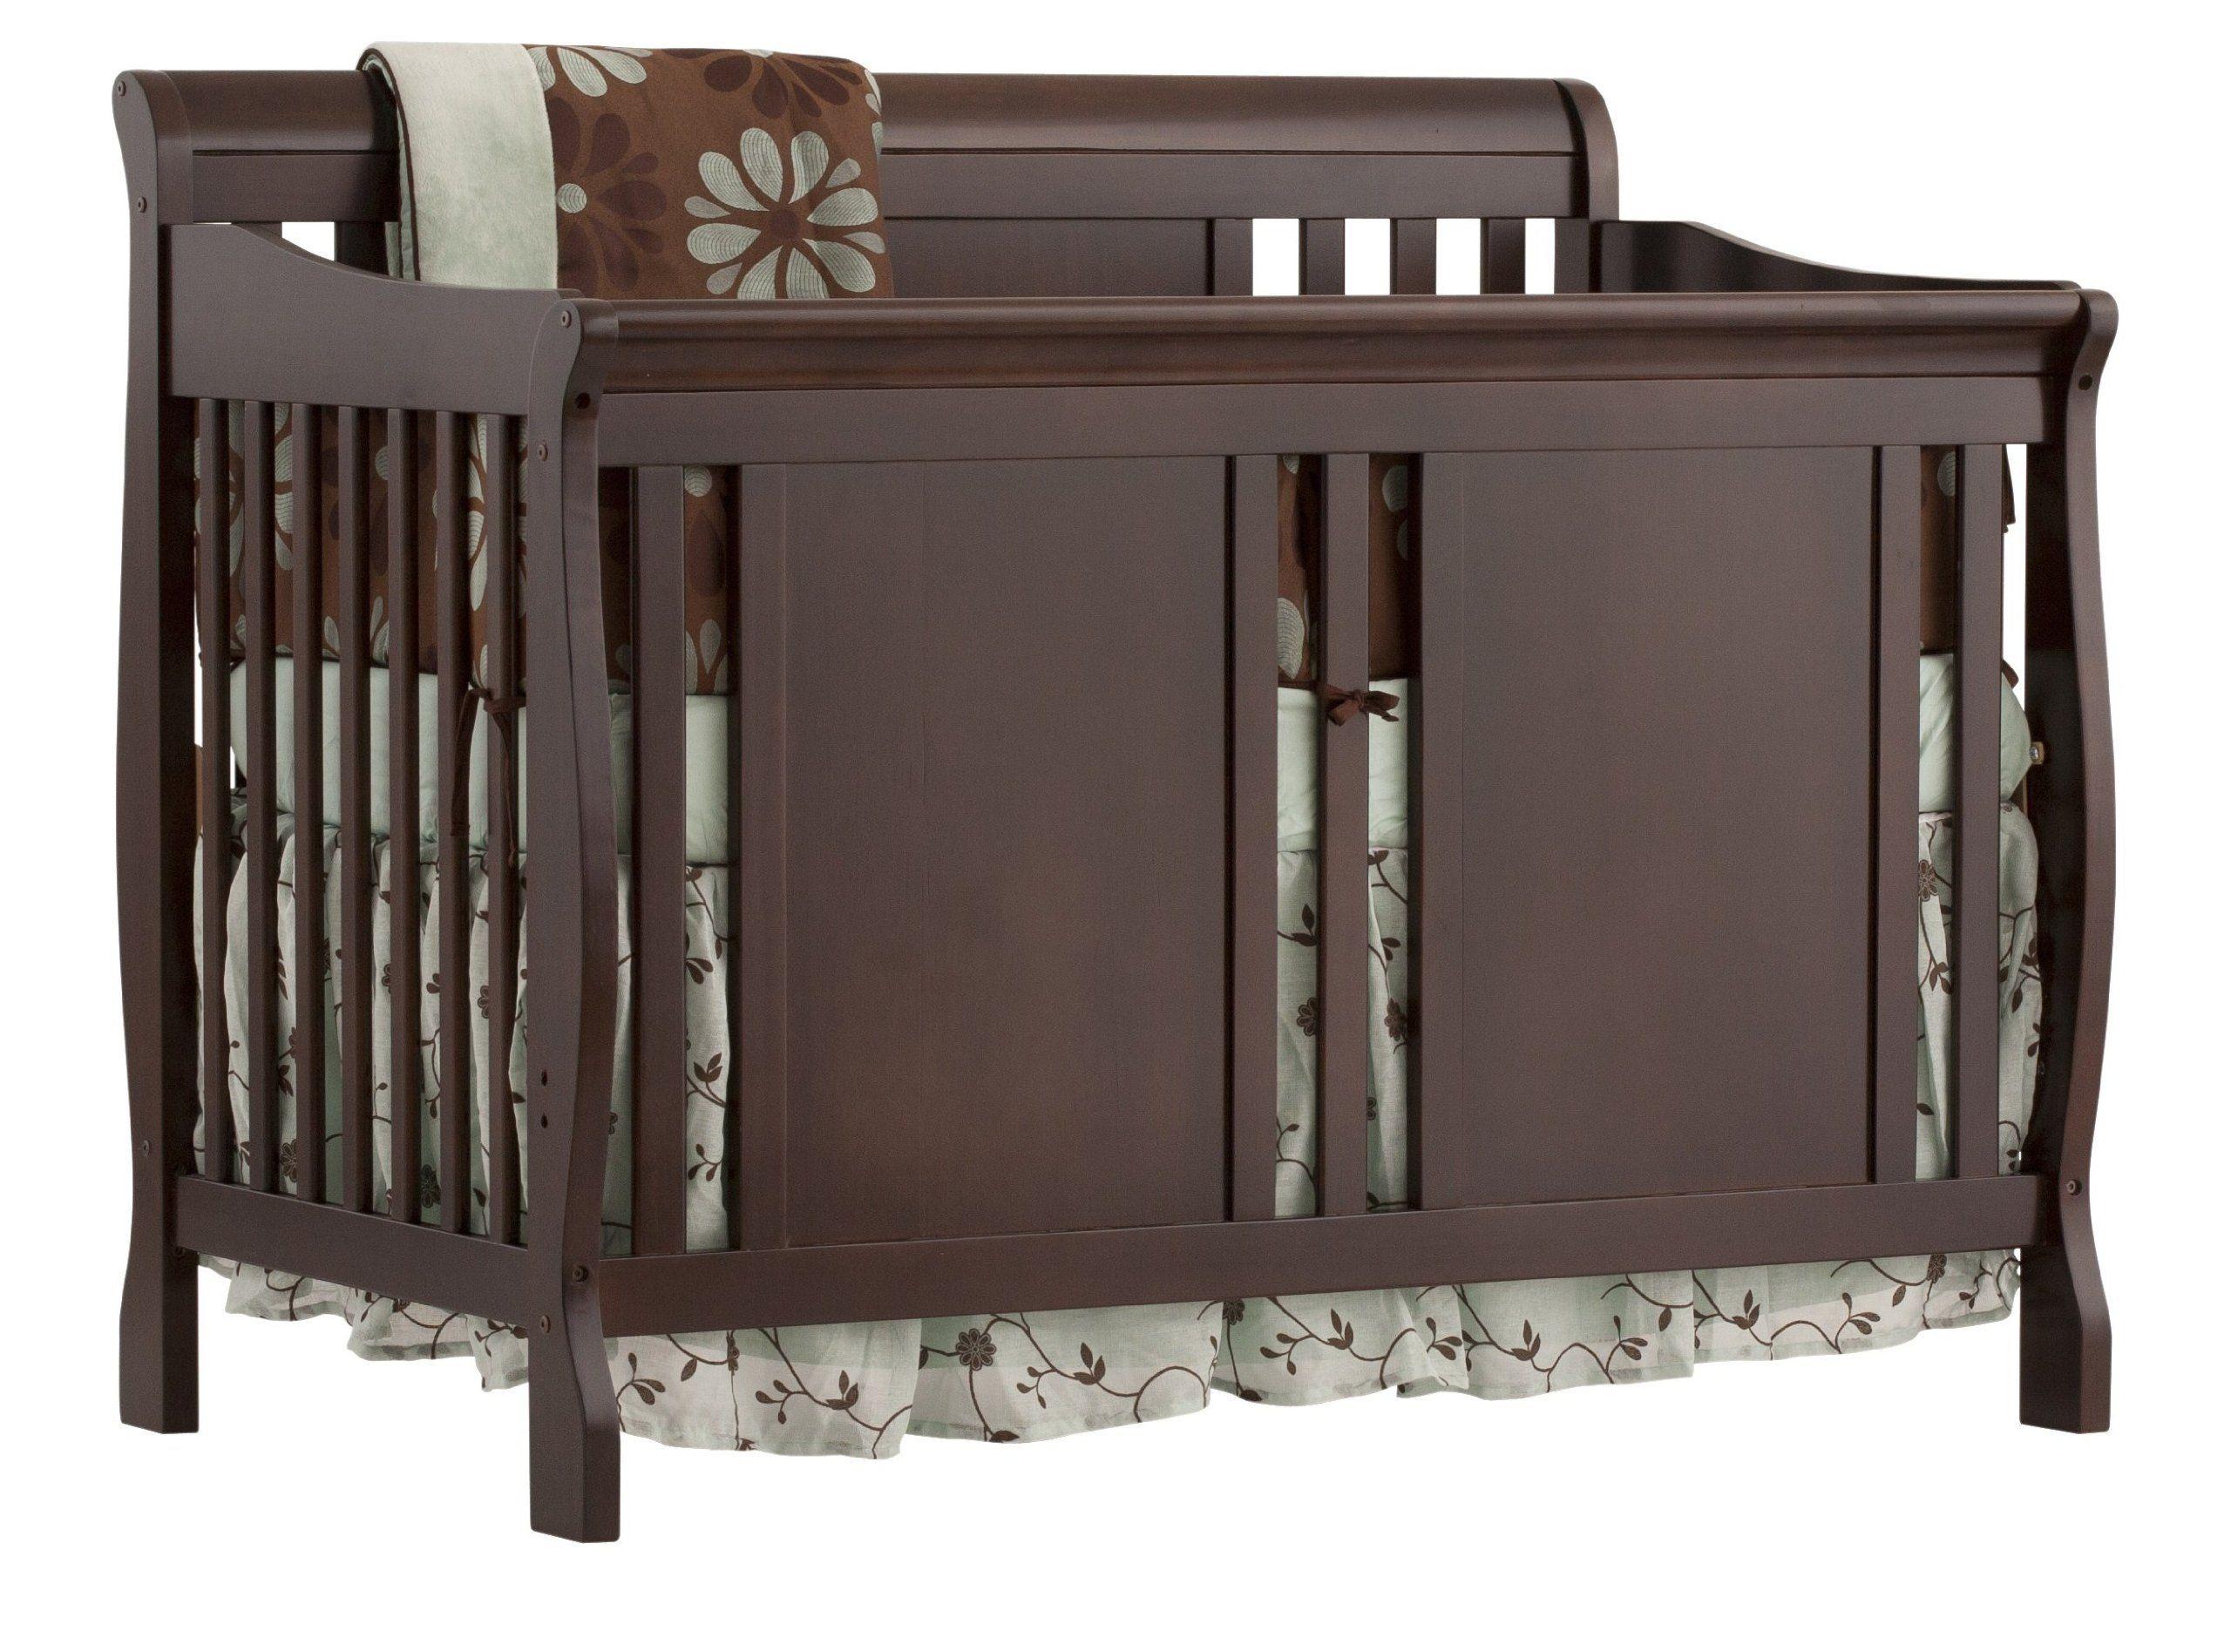 Stork Craft Verona 4 In 1 Fixed Side Convertible Crib Espresso Cribs Convertible Crib Traditional Cribs [ 1896 x 2560 Pixel ]